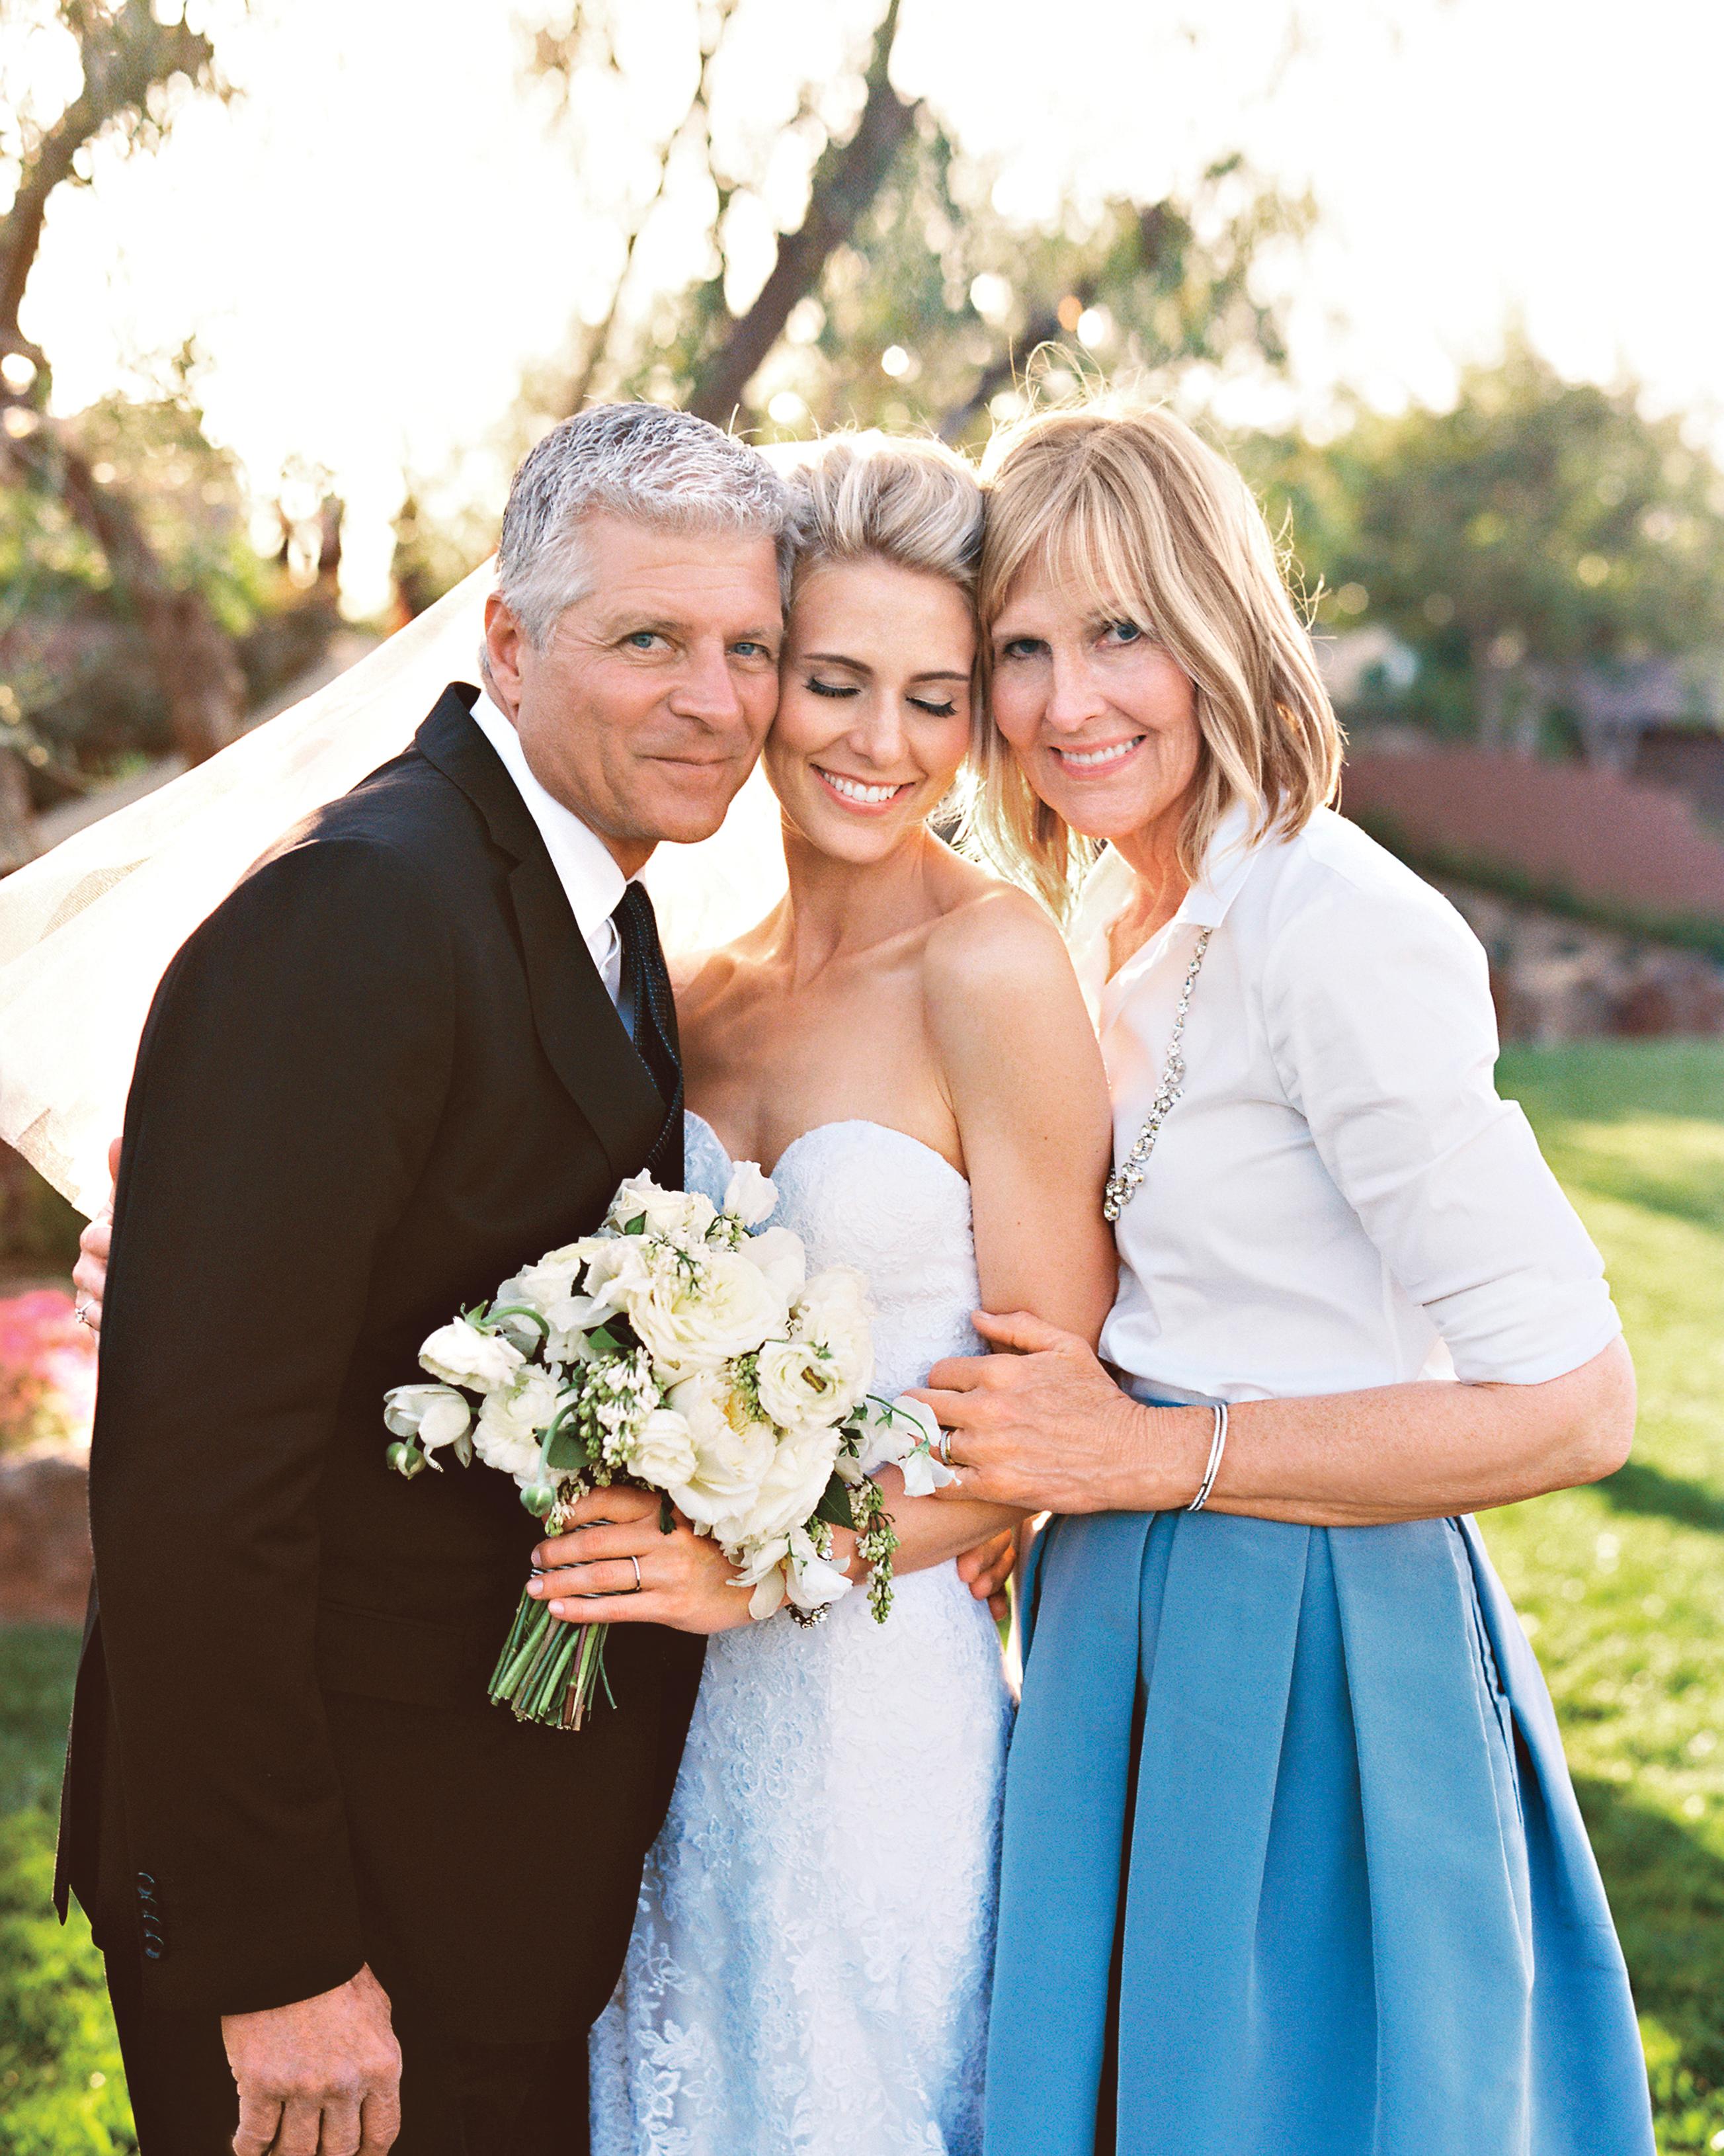 brooke-shea-wedding-371-d111277.jpg